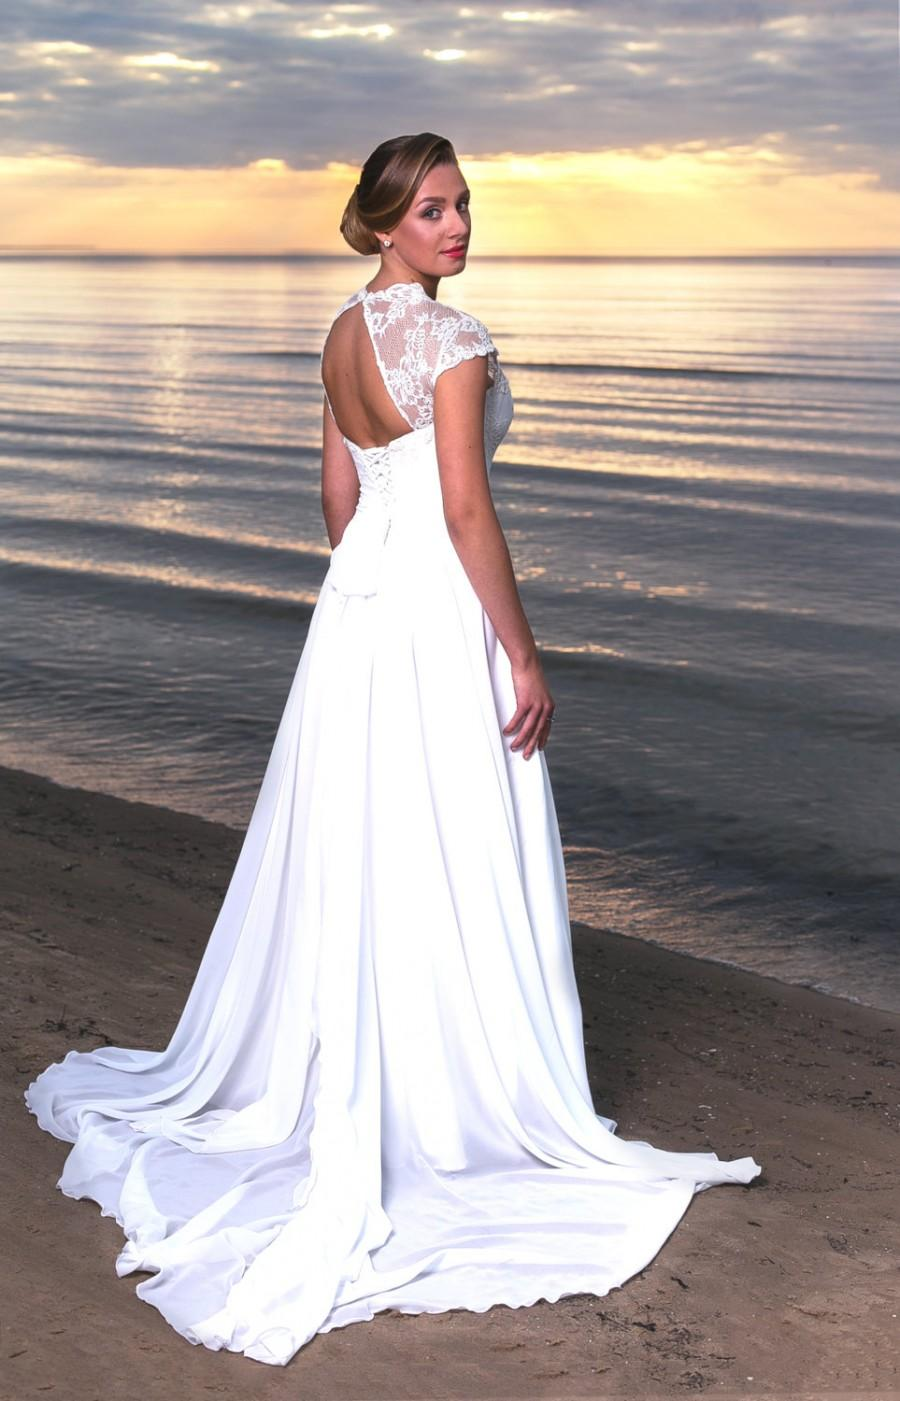 Vintage-Inspired Lace Wedding Dresses